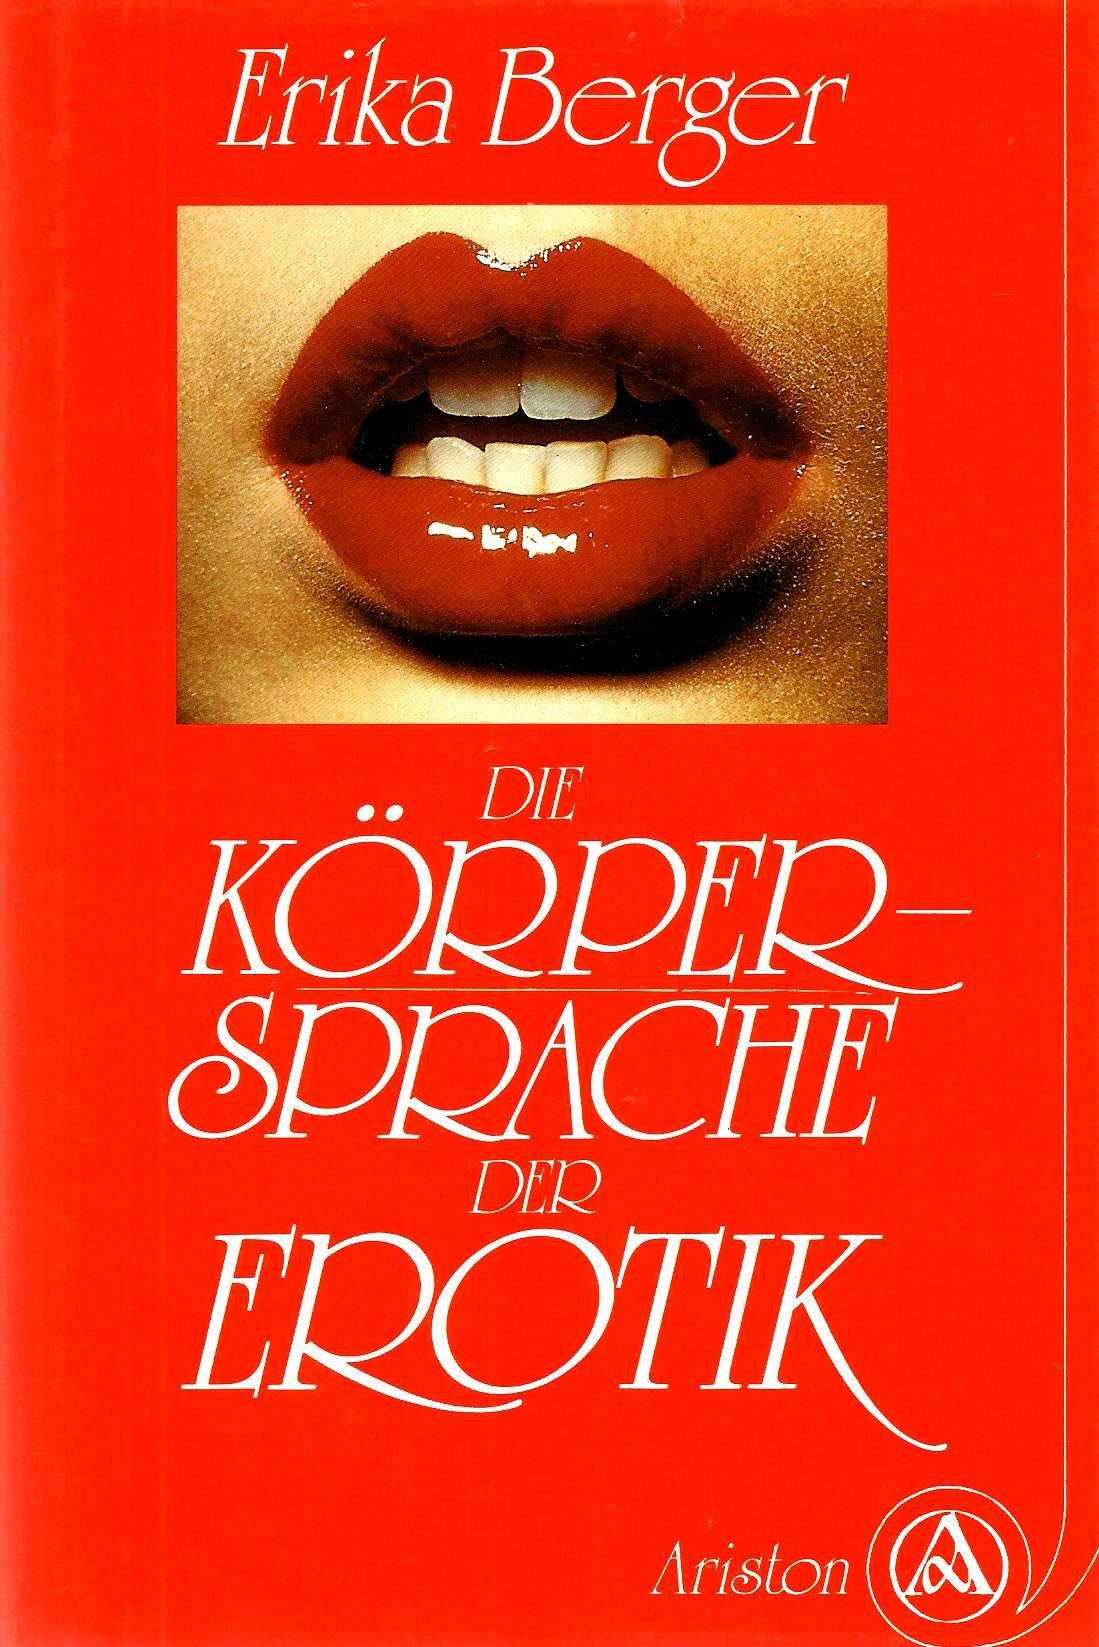 Körpersprache der Erotik